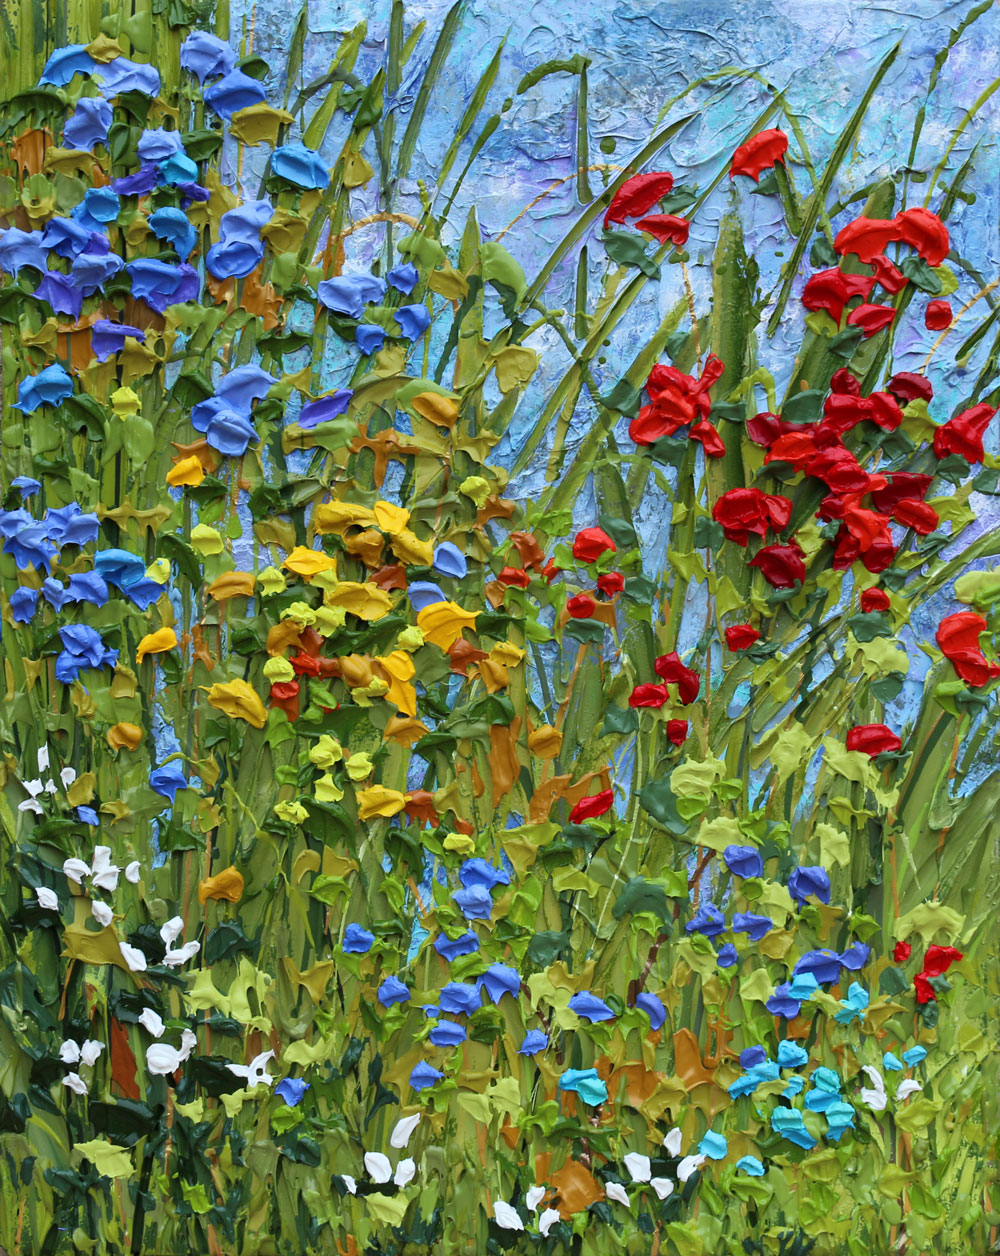 Tuscan Picnic - Jeff Hanson Art Original Painting